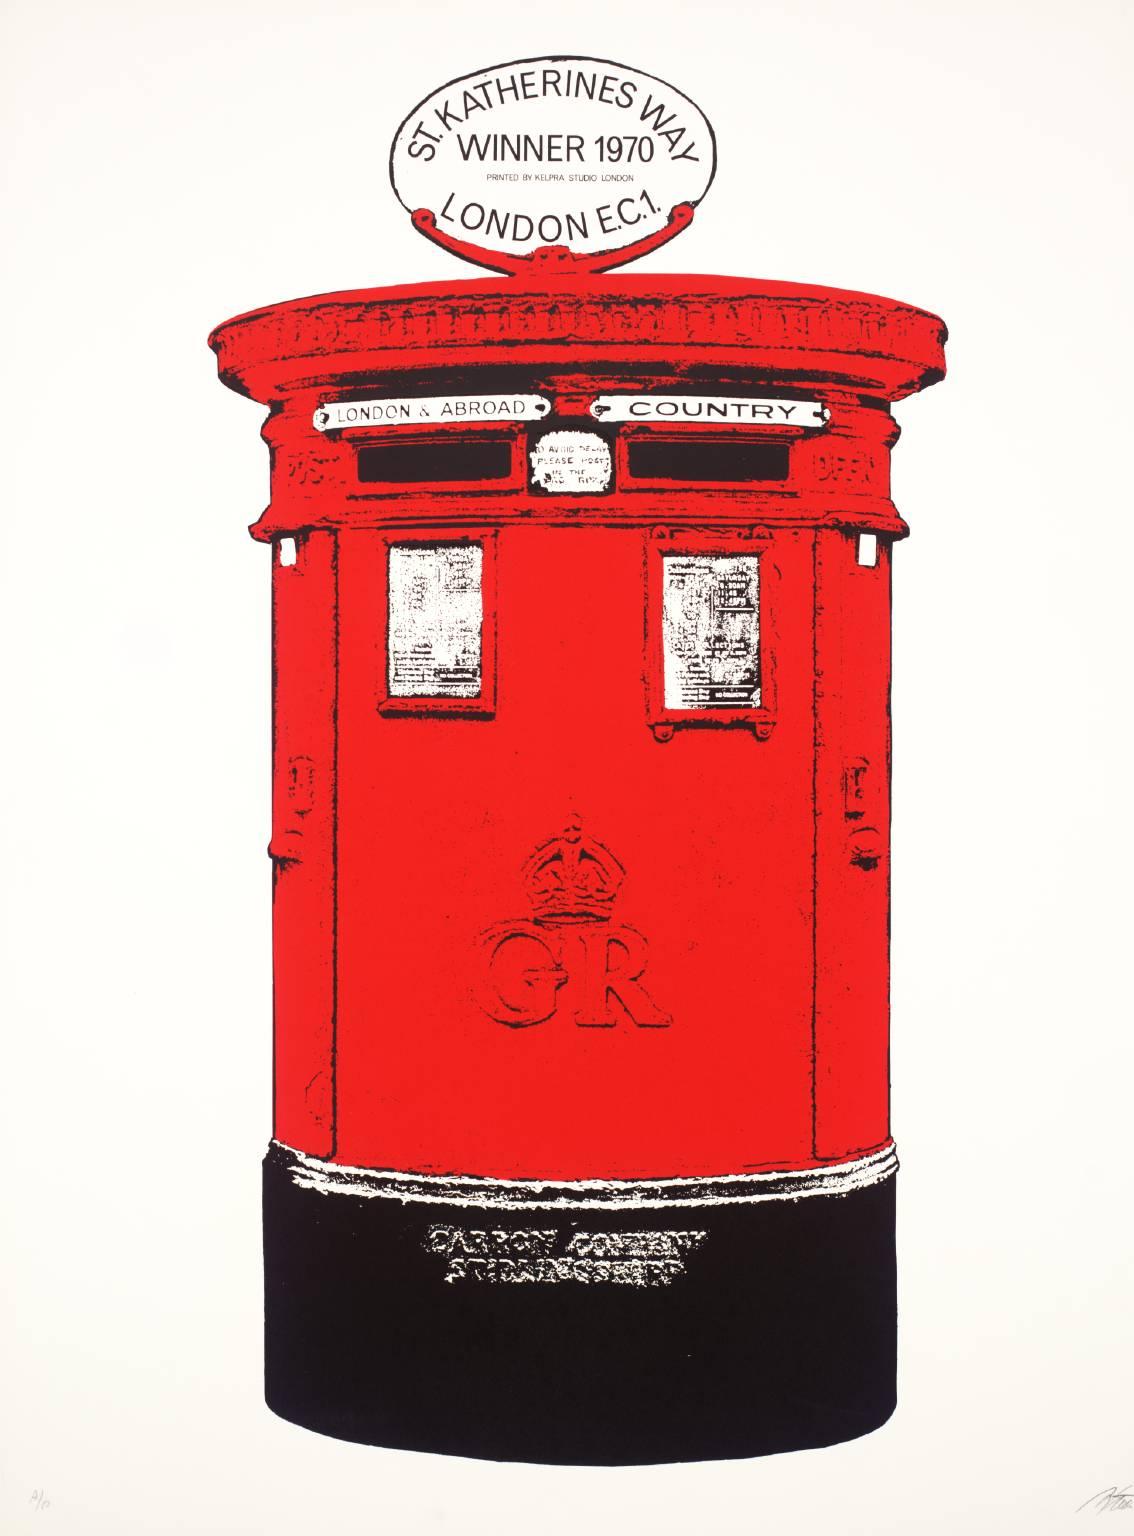 Gerd Winner  born 1936, From London Docks: St Katharine's Way